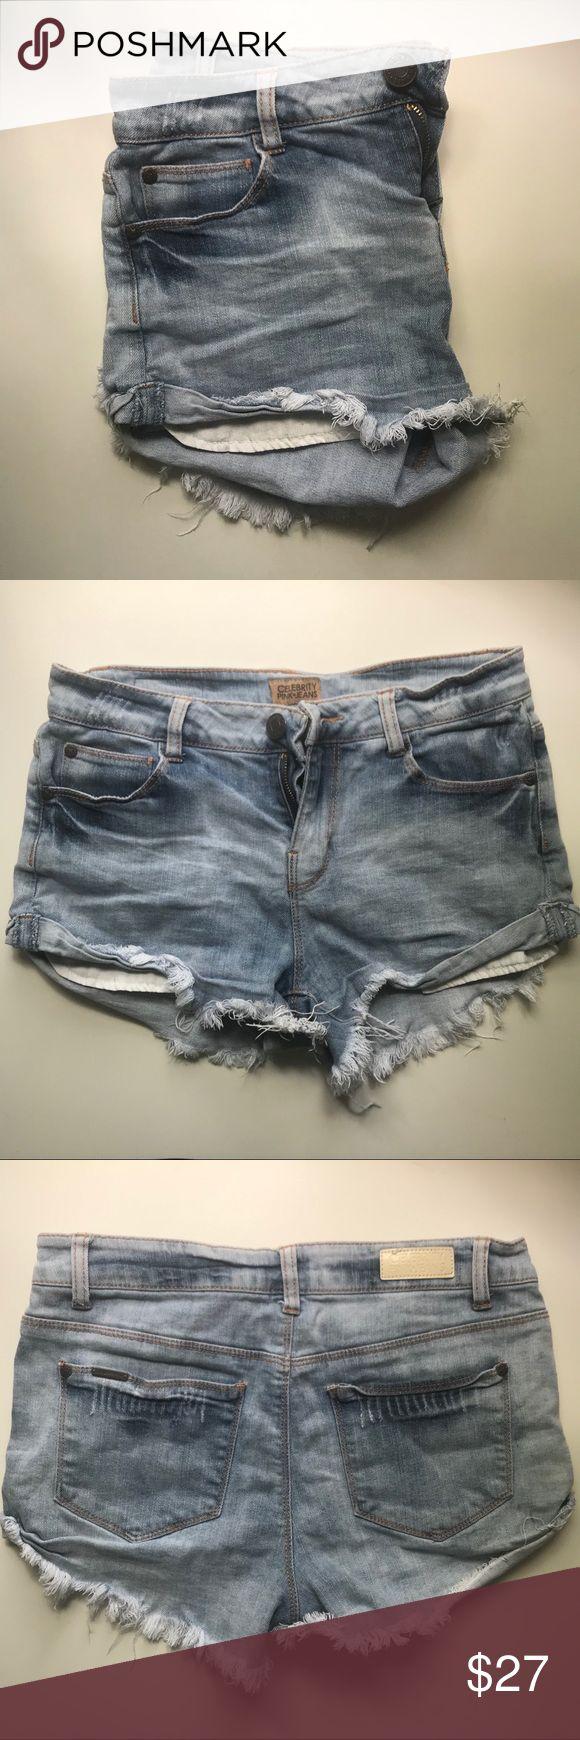 Acid Light Wash Denim Jeansshorts Größe 4 Light Wash Art von Acid Toned Denim Shi …   – My Posh Picks